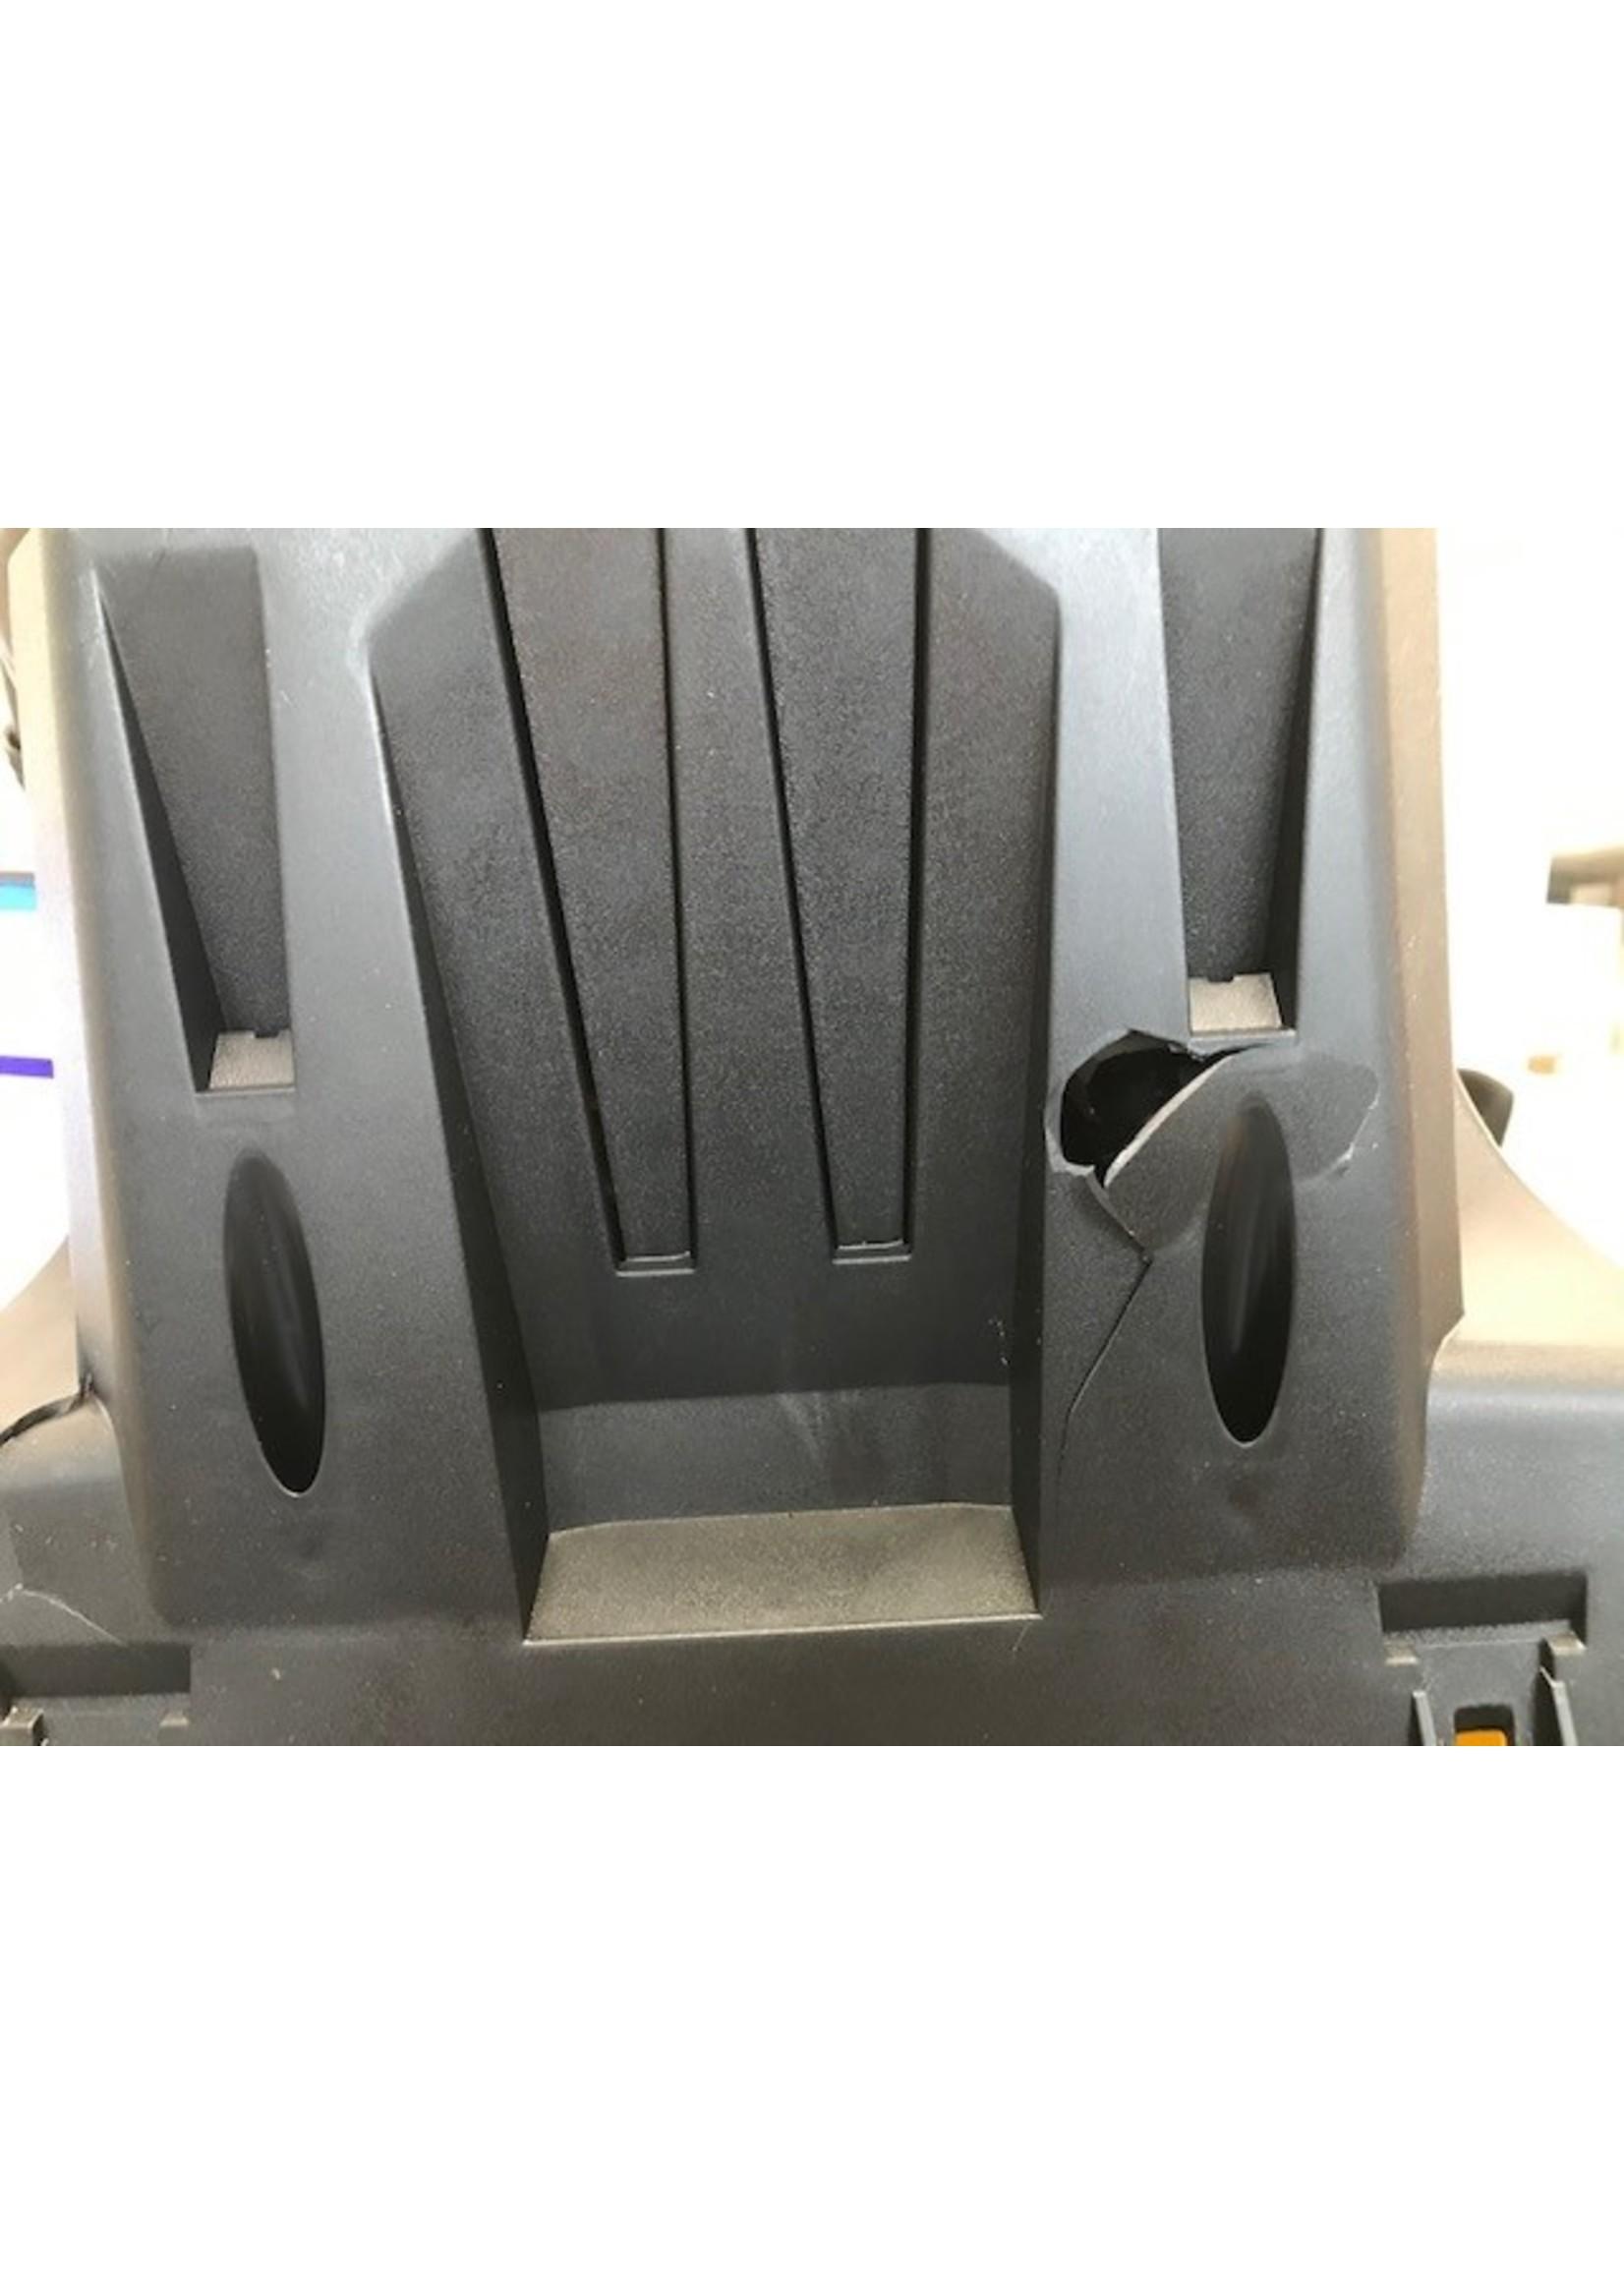 Kärcher Kärcher K 5 Full Control hogedrukreiniger Staand Electrisch Zwart, Geel 500 L/u 2100 W koopjeshoek